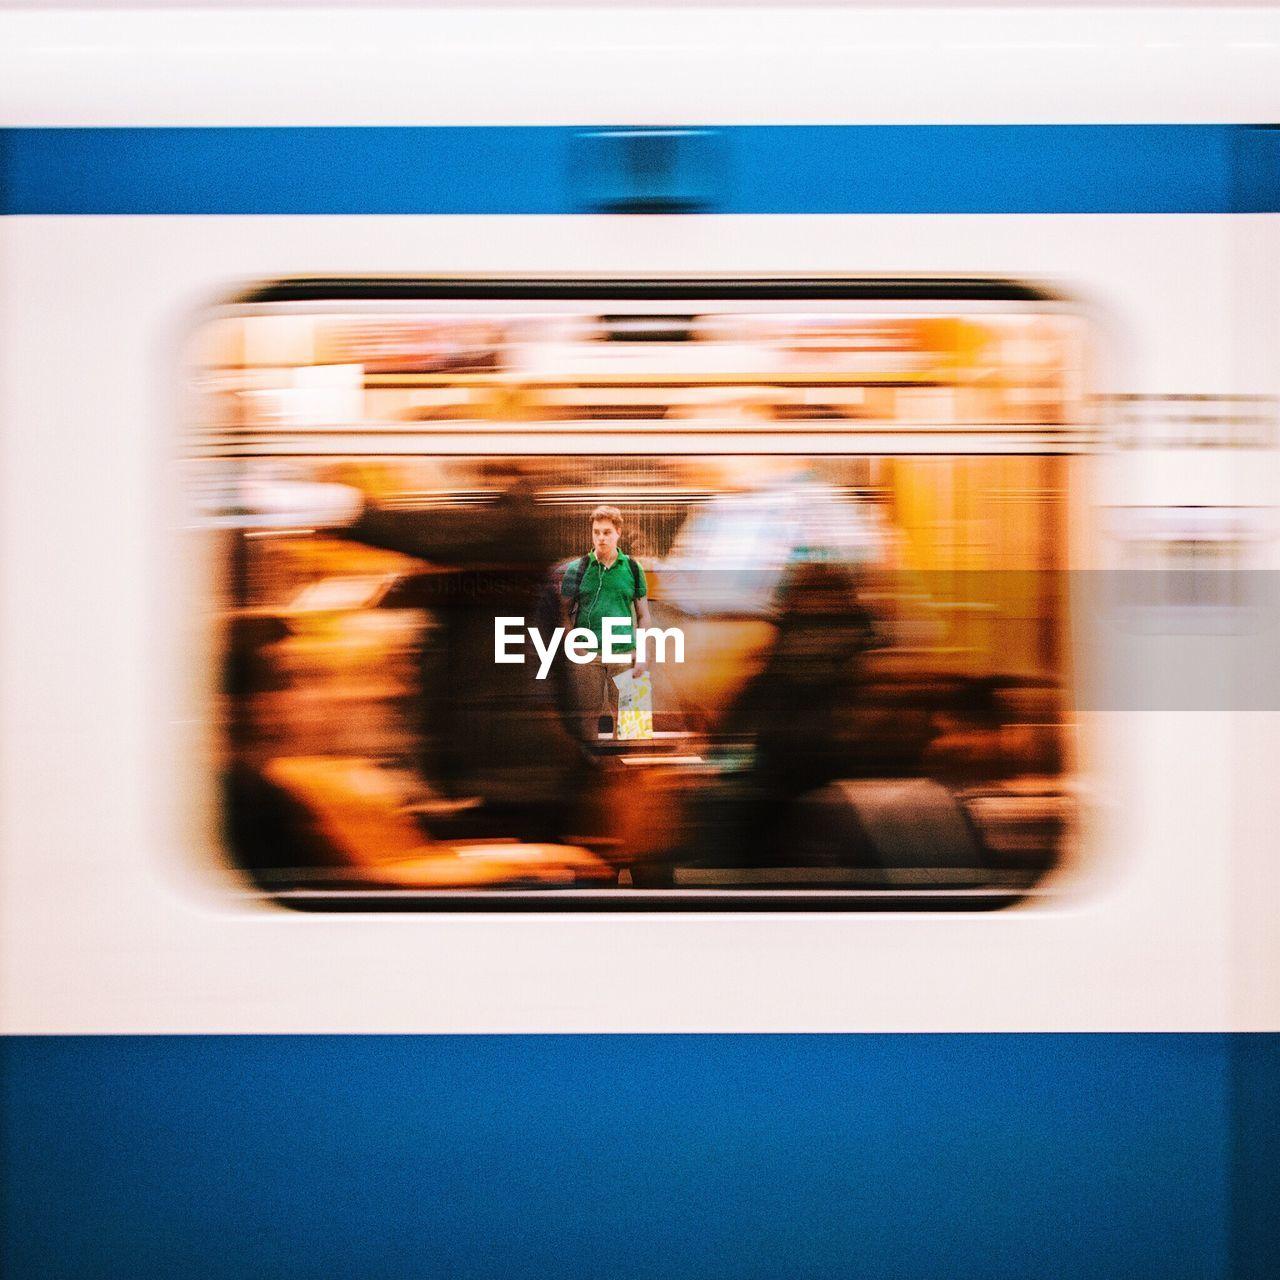 transportation, mode of transport, blurred motion, train - vehicle, land vehicle, metro train, public transportation, passenger train, motion, real people, speed, journey, men, day, outdoors